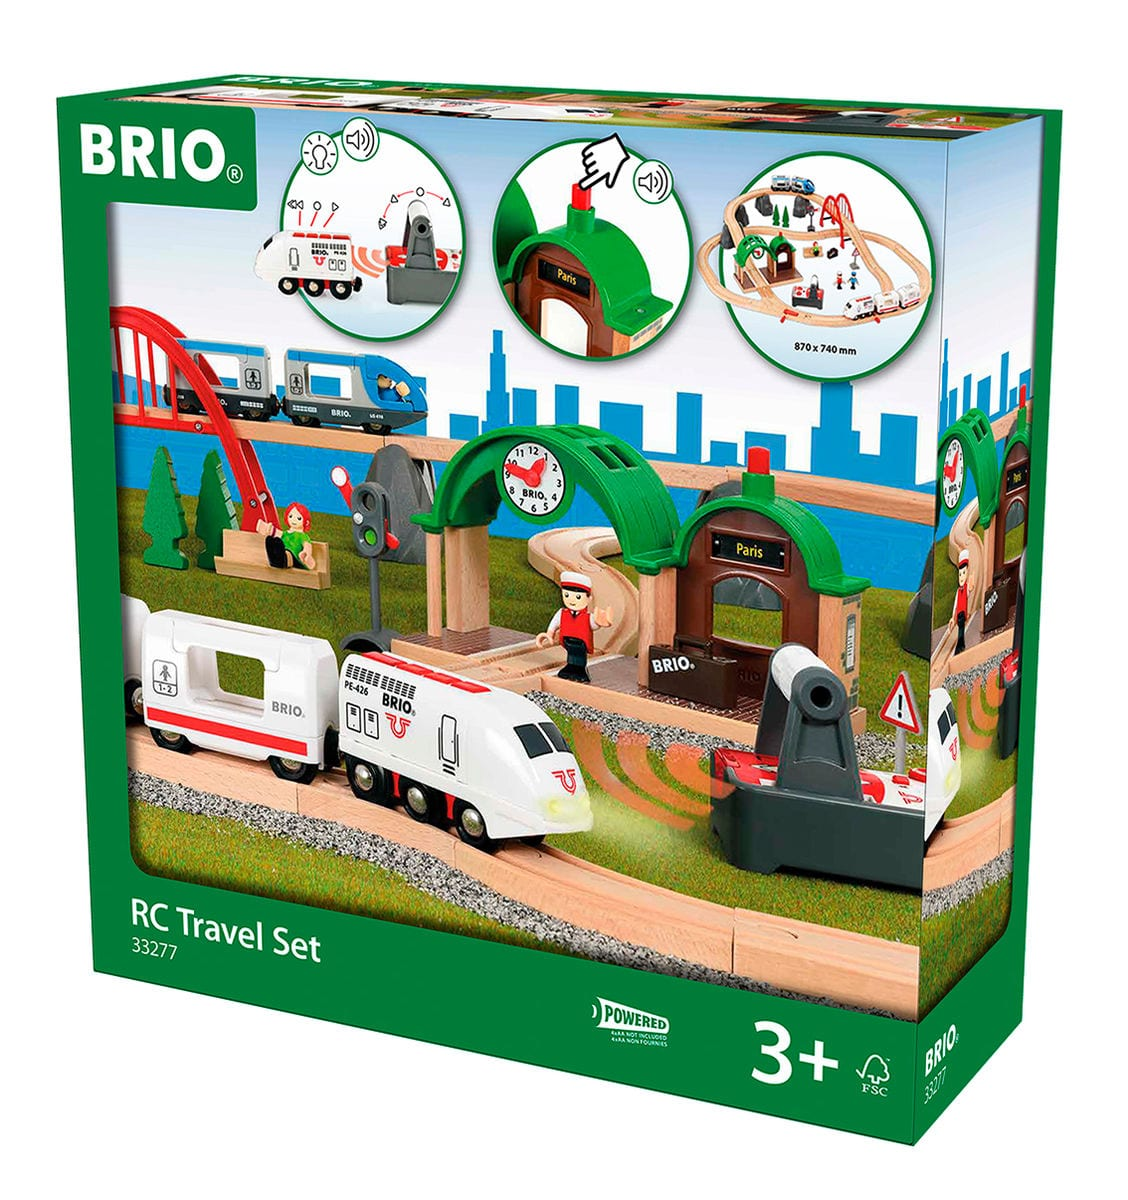 BRIO Countryside Railway Set